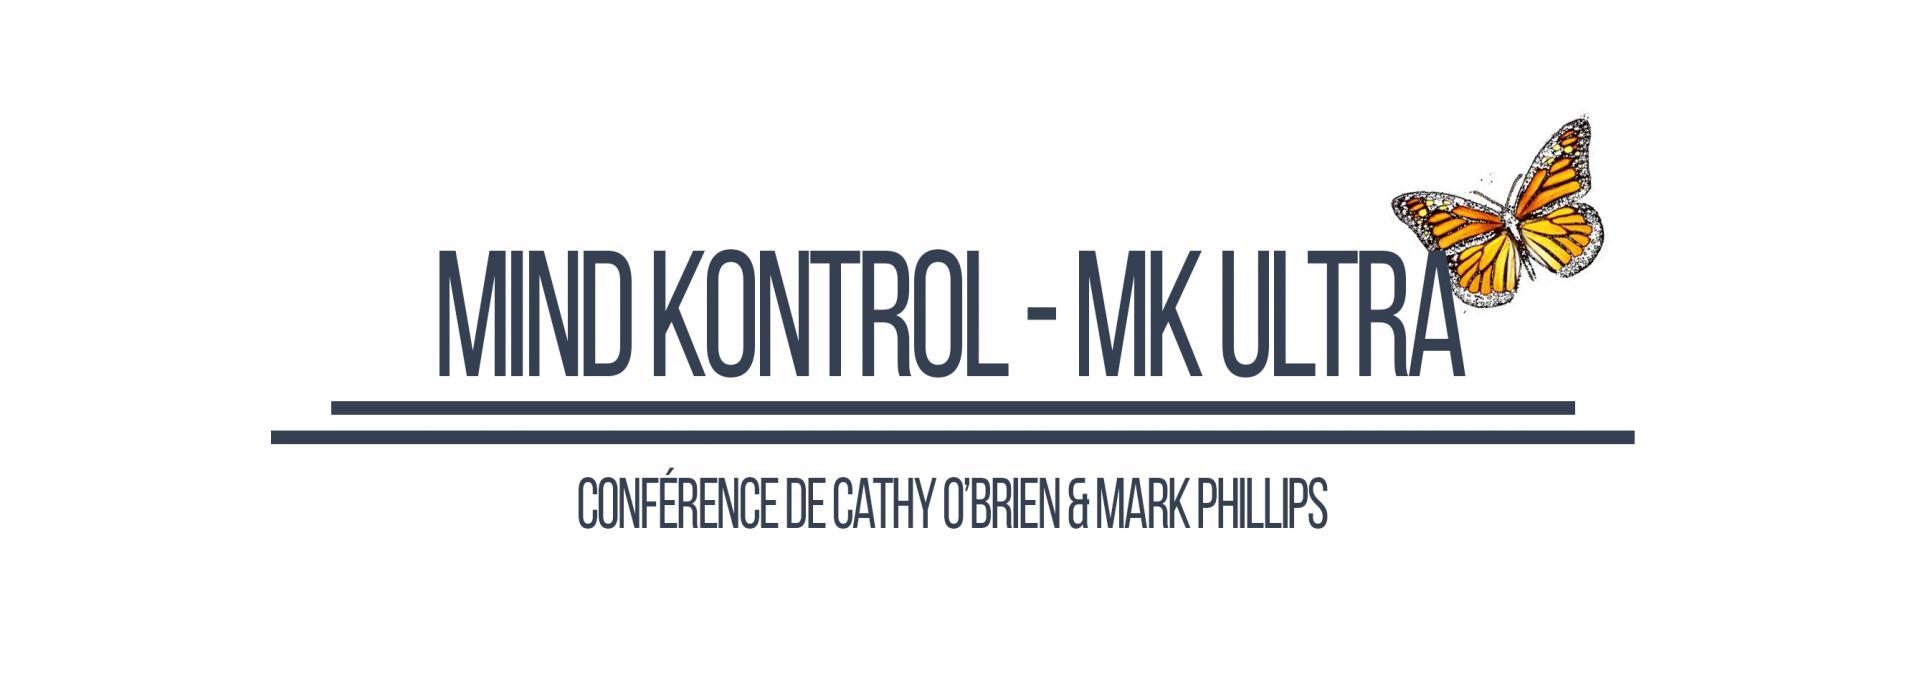 Mind kontrol conference cathy o brien